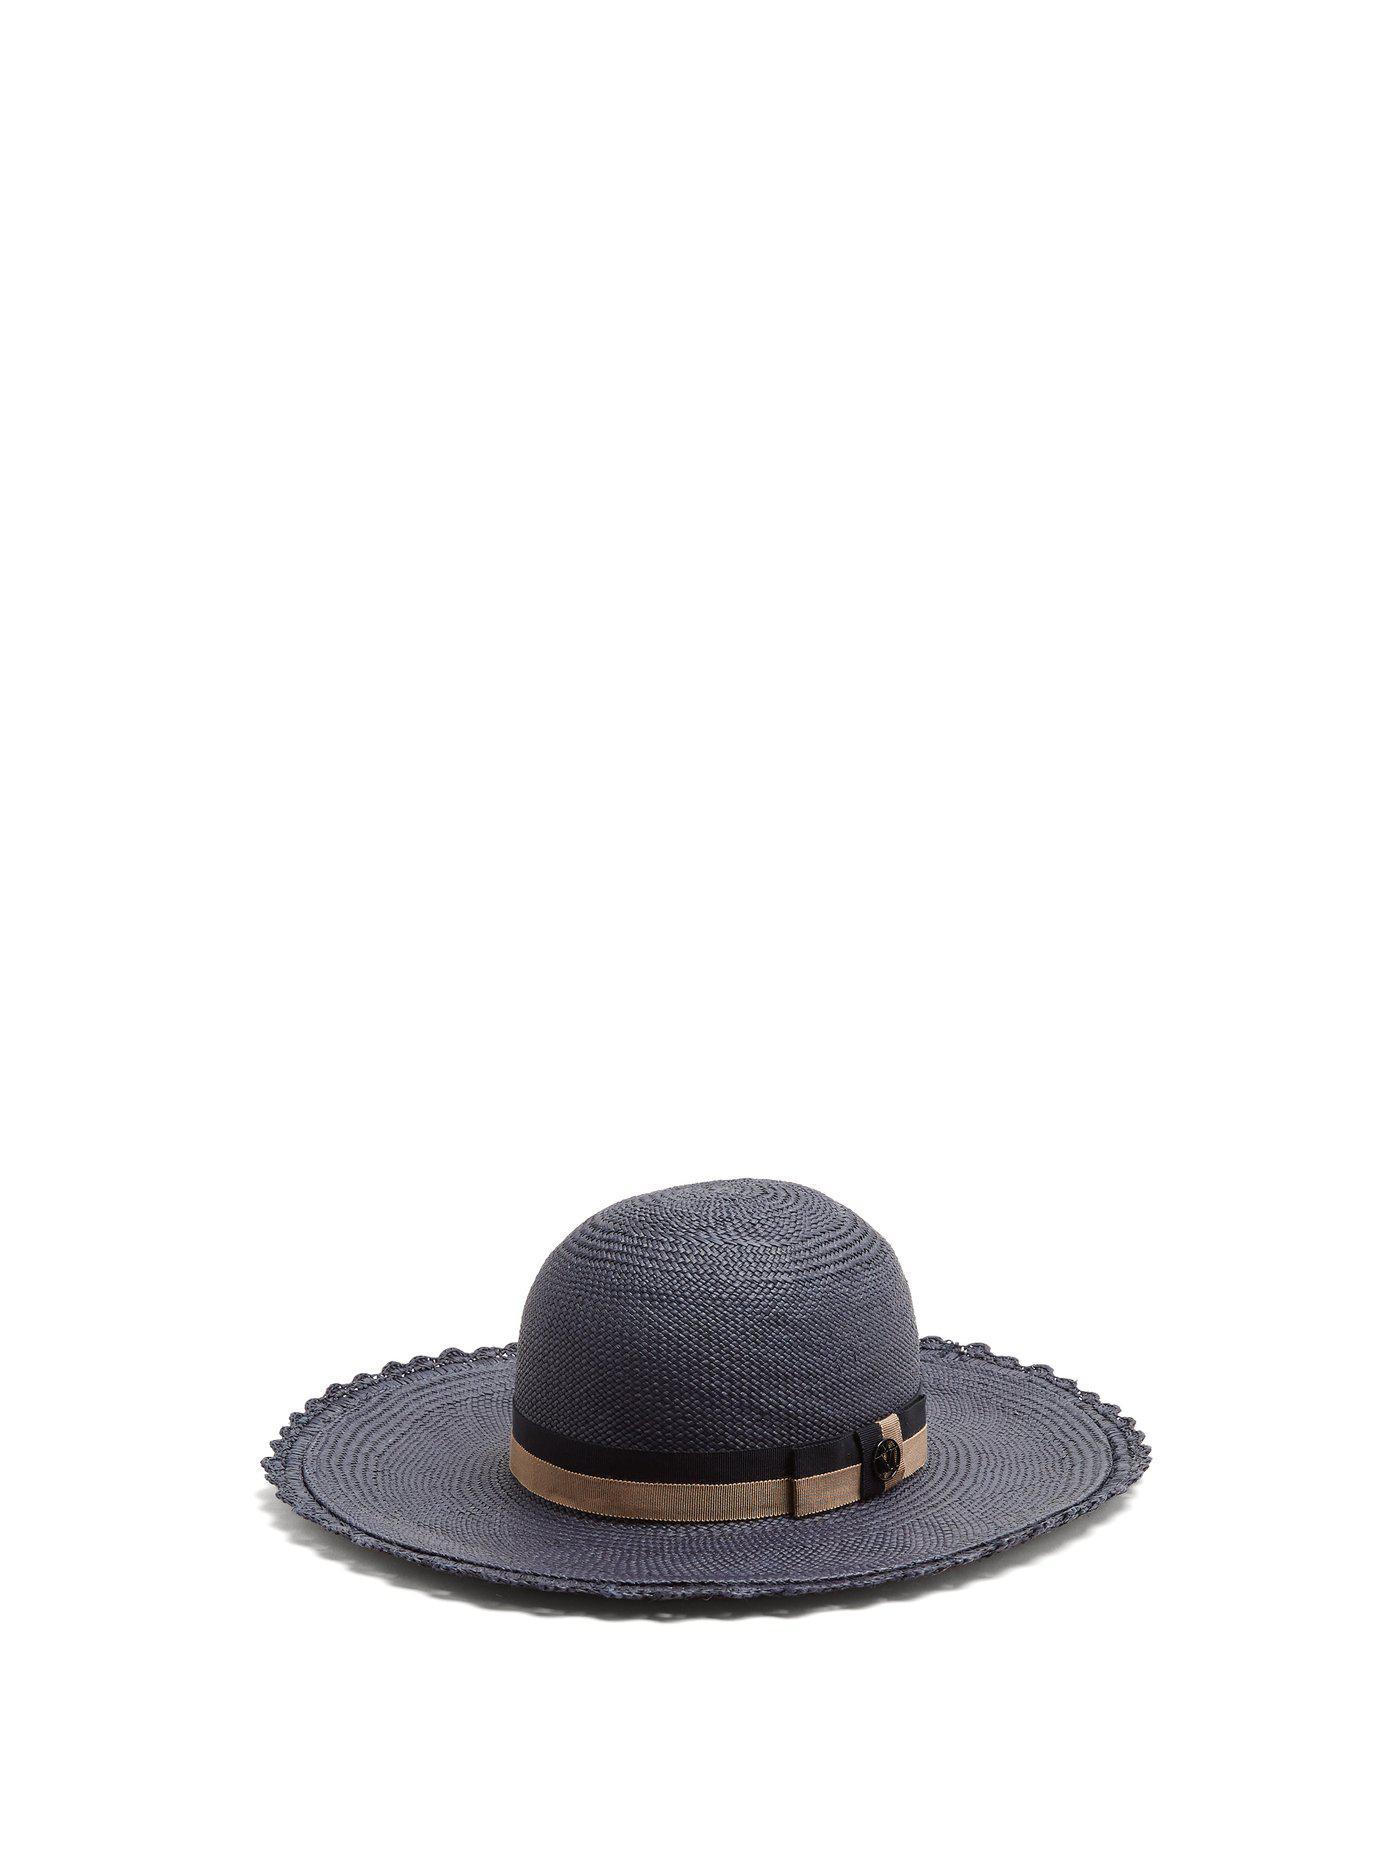 Alice Straw Hat Maison Michel aQ1hbyFS74